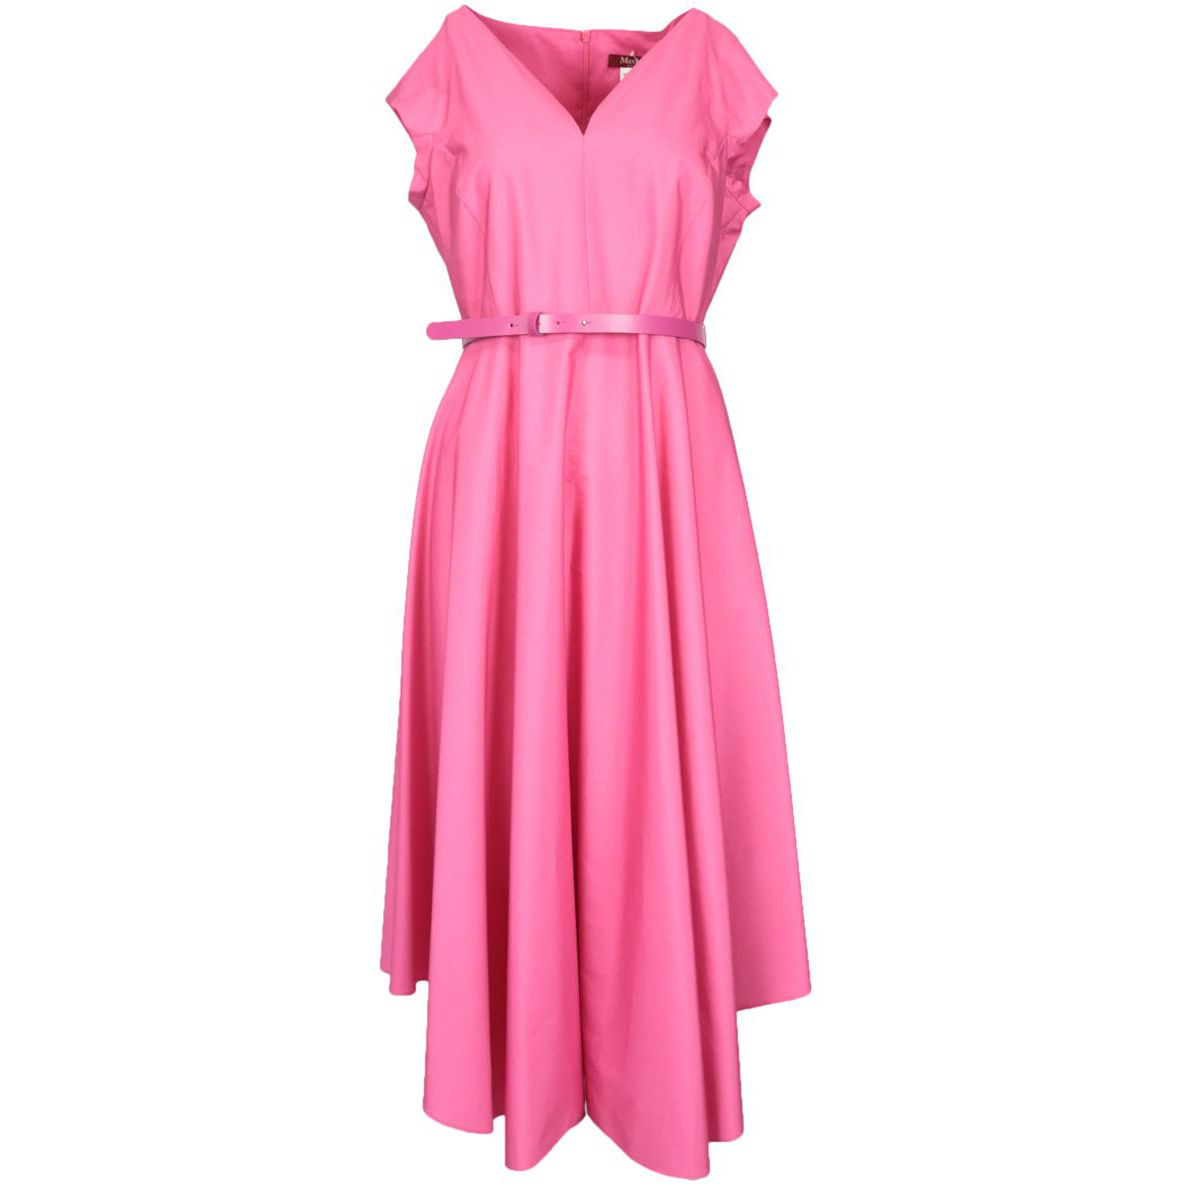 Primo cotton dress with belt and V-neck Fuchsia MAX MARA STUDIO